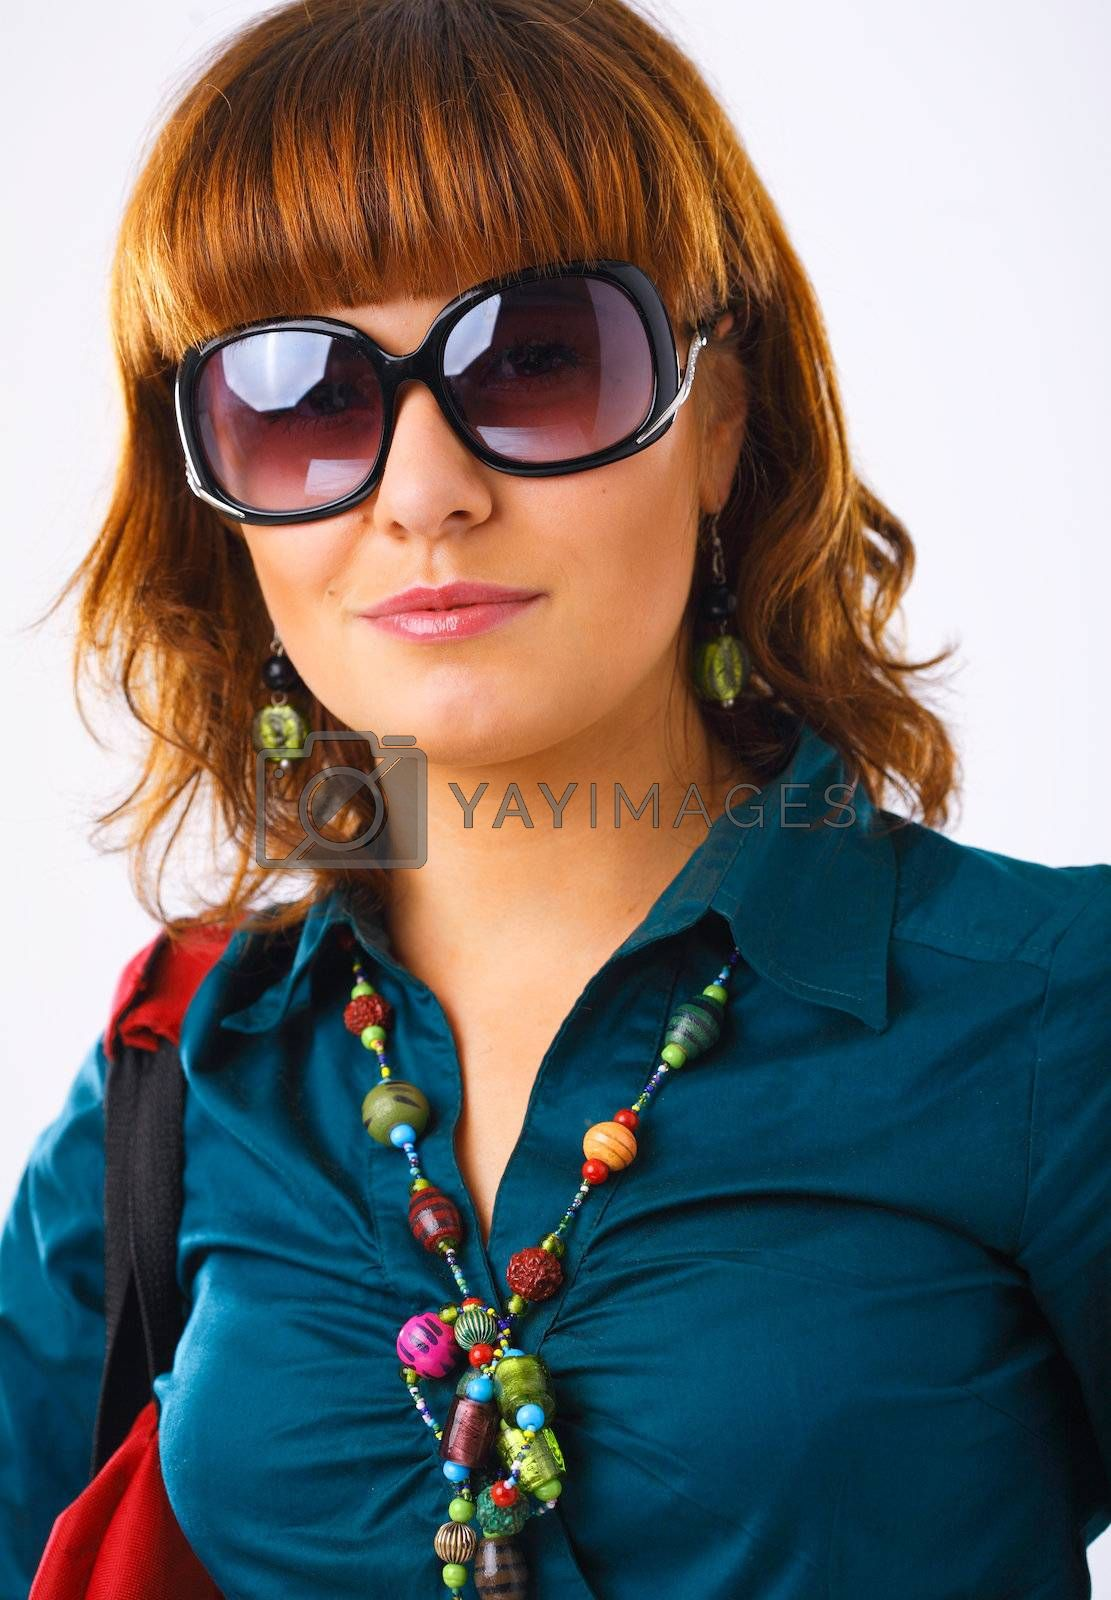 Beautiful young woman in sun glasses